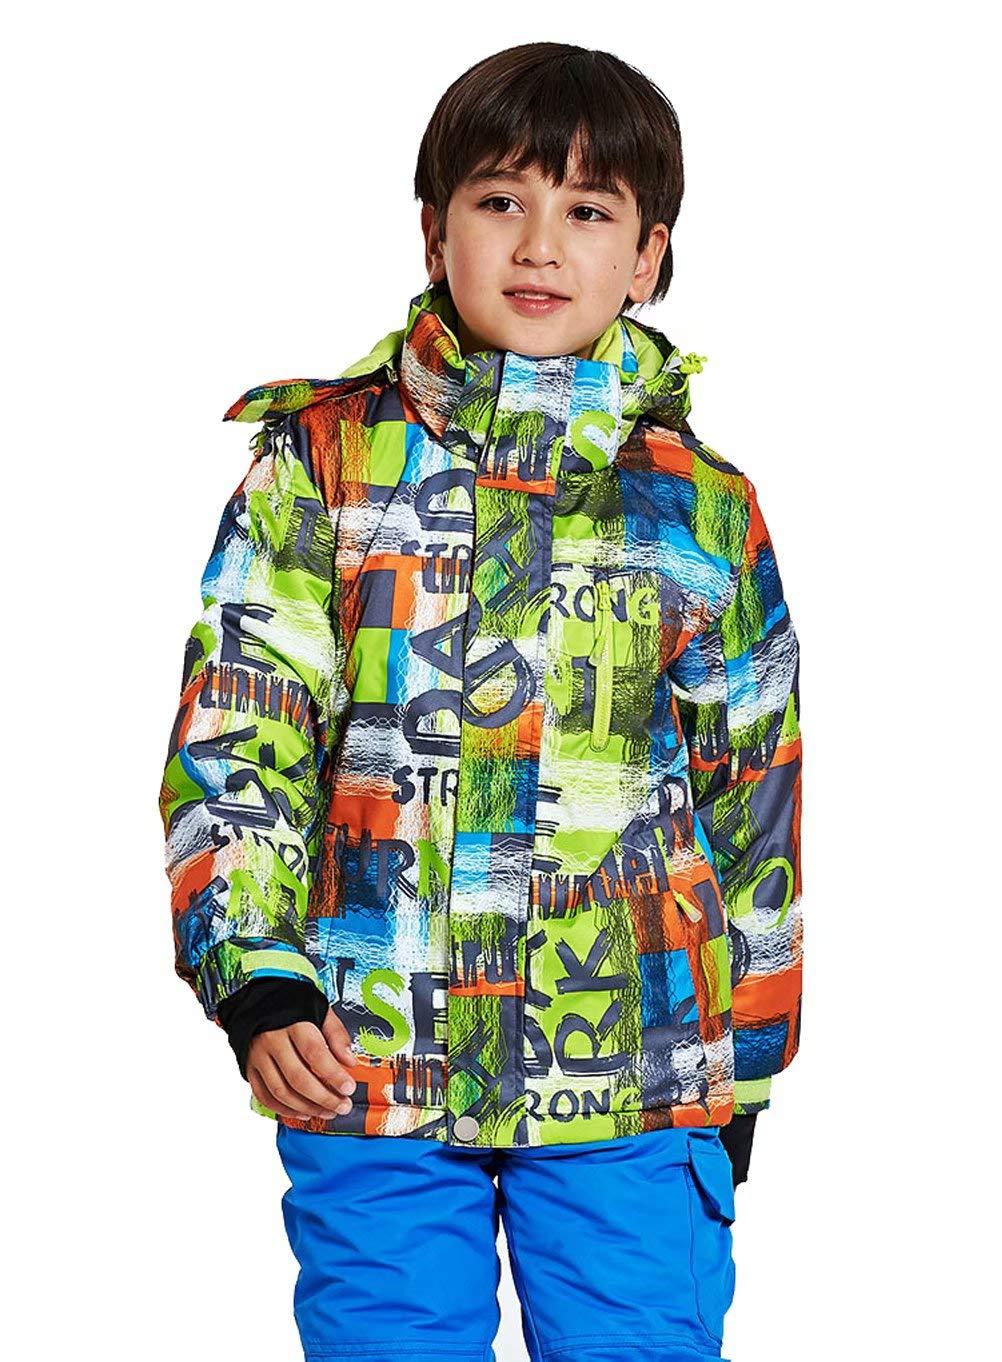 Kayiyasuスキーウェア スキージャケット 子供用 女の子 男の子 ジュニア用 アウター スポーツ スノーウェア 登山服 山登り 防寒着 撥水 防風 041-wdn-pyj623 B07GXK3MP1 110 色2 色2 110